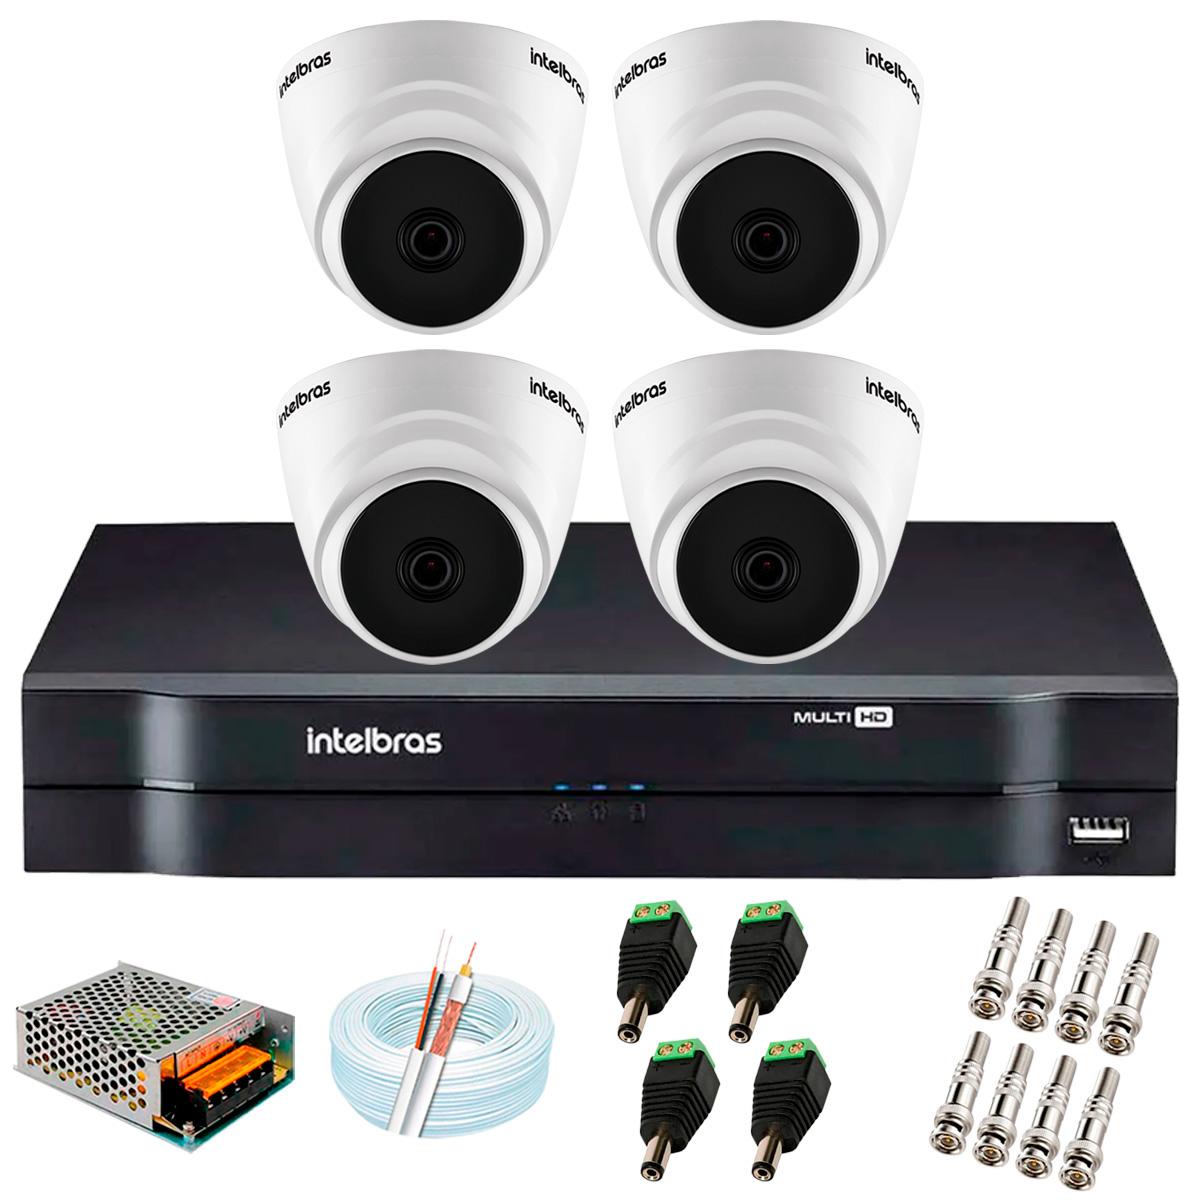 kit-intelbras-2-cameras-hd-720p-vhd-1120-d-g6-dvr-1104-intelbras-acessorios-hd-1tb-para-armazenamento-app-gratis-de-monitoramento01